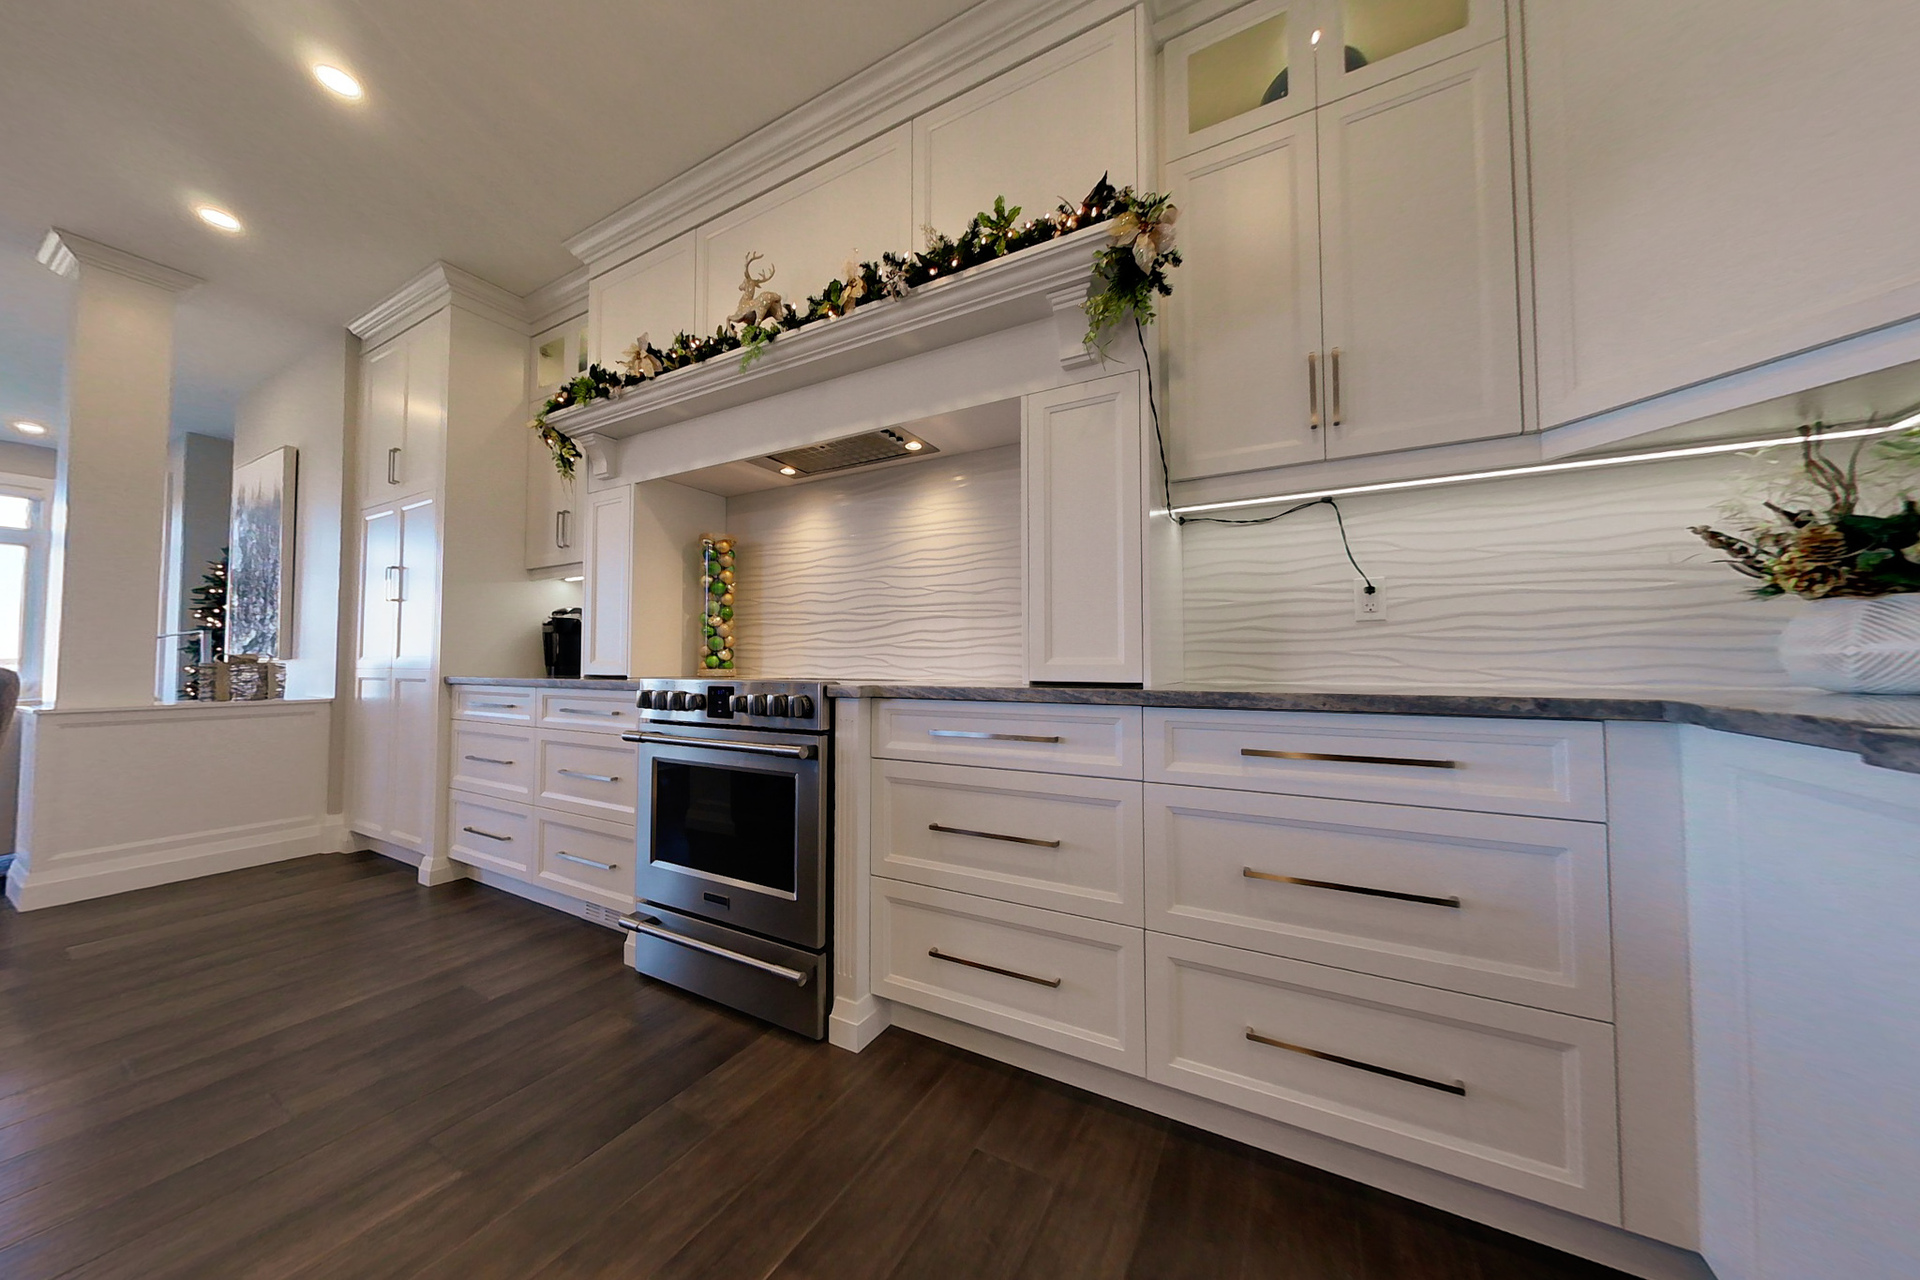 77-navigation-drive-kitchen2 at 77 Navigation Drive, Prince Edward County,